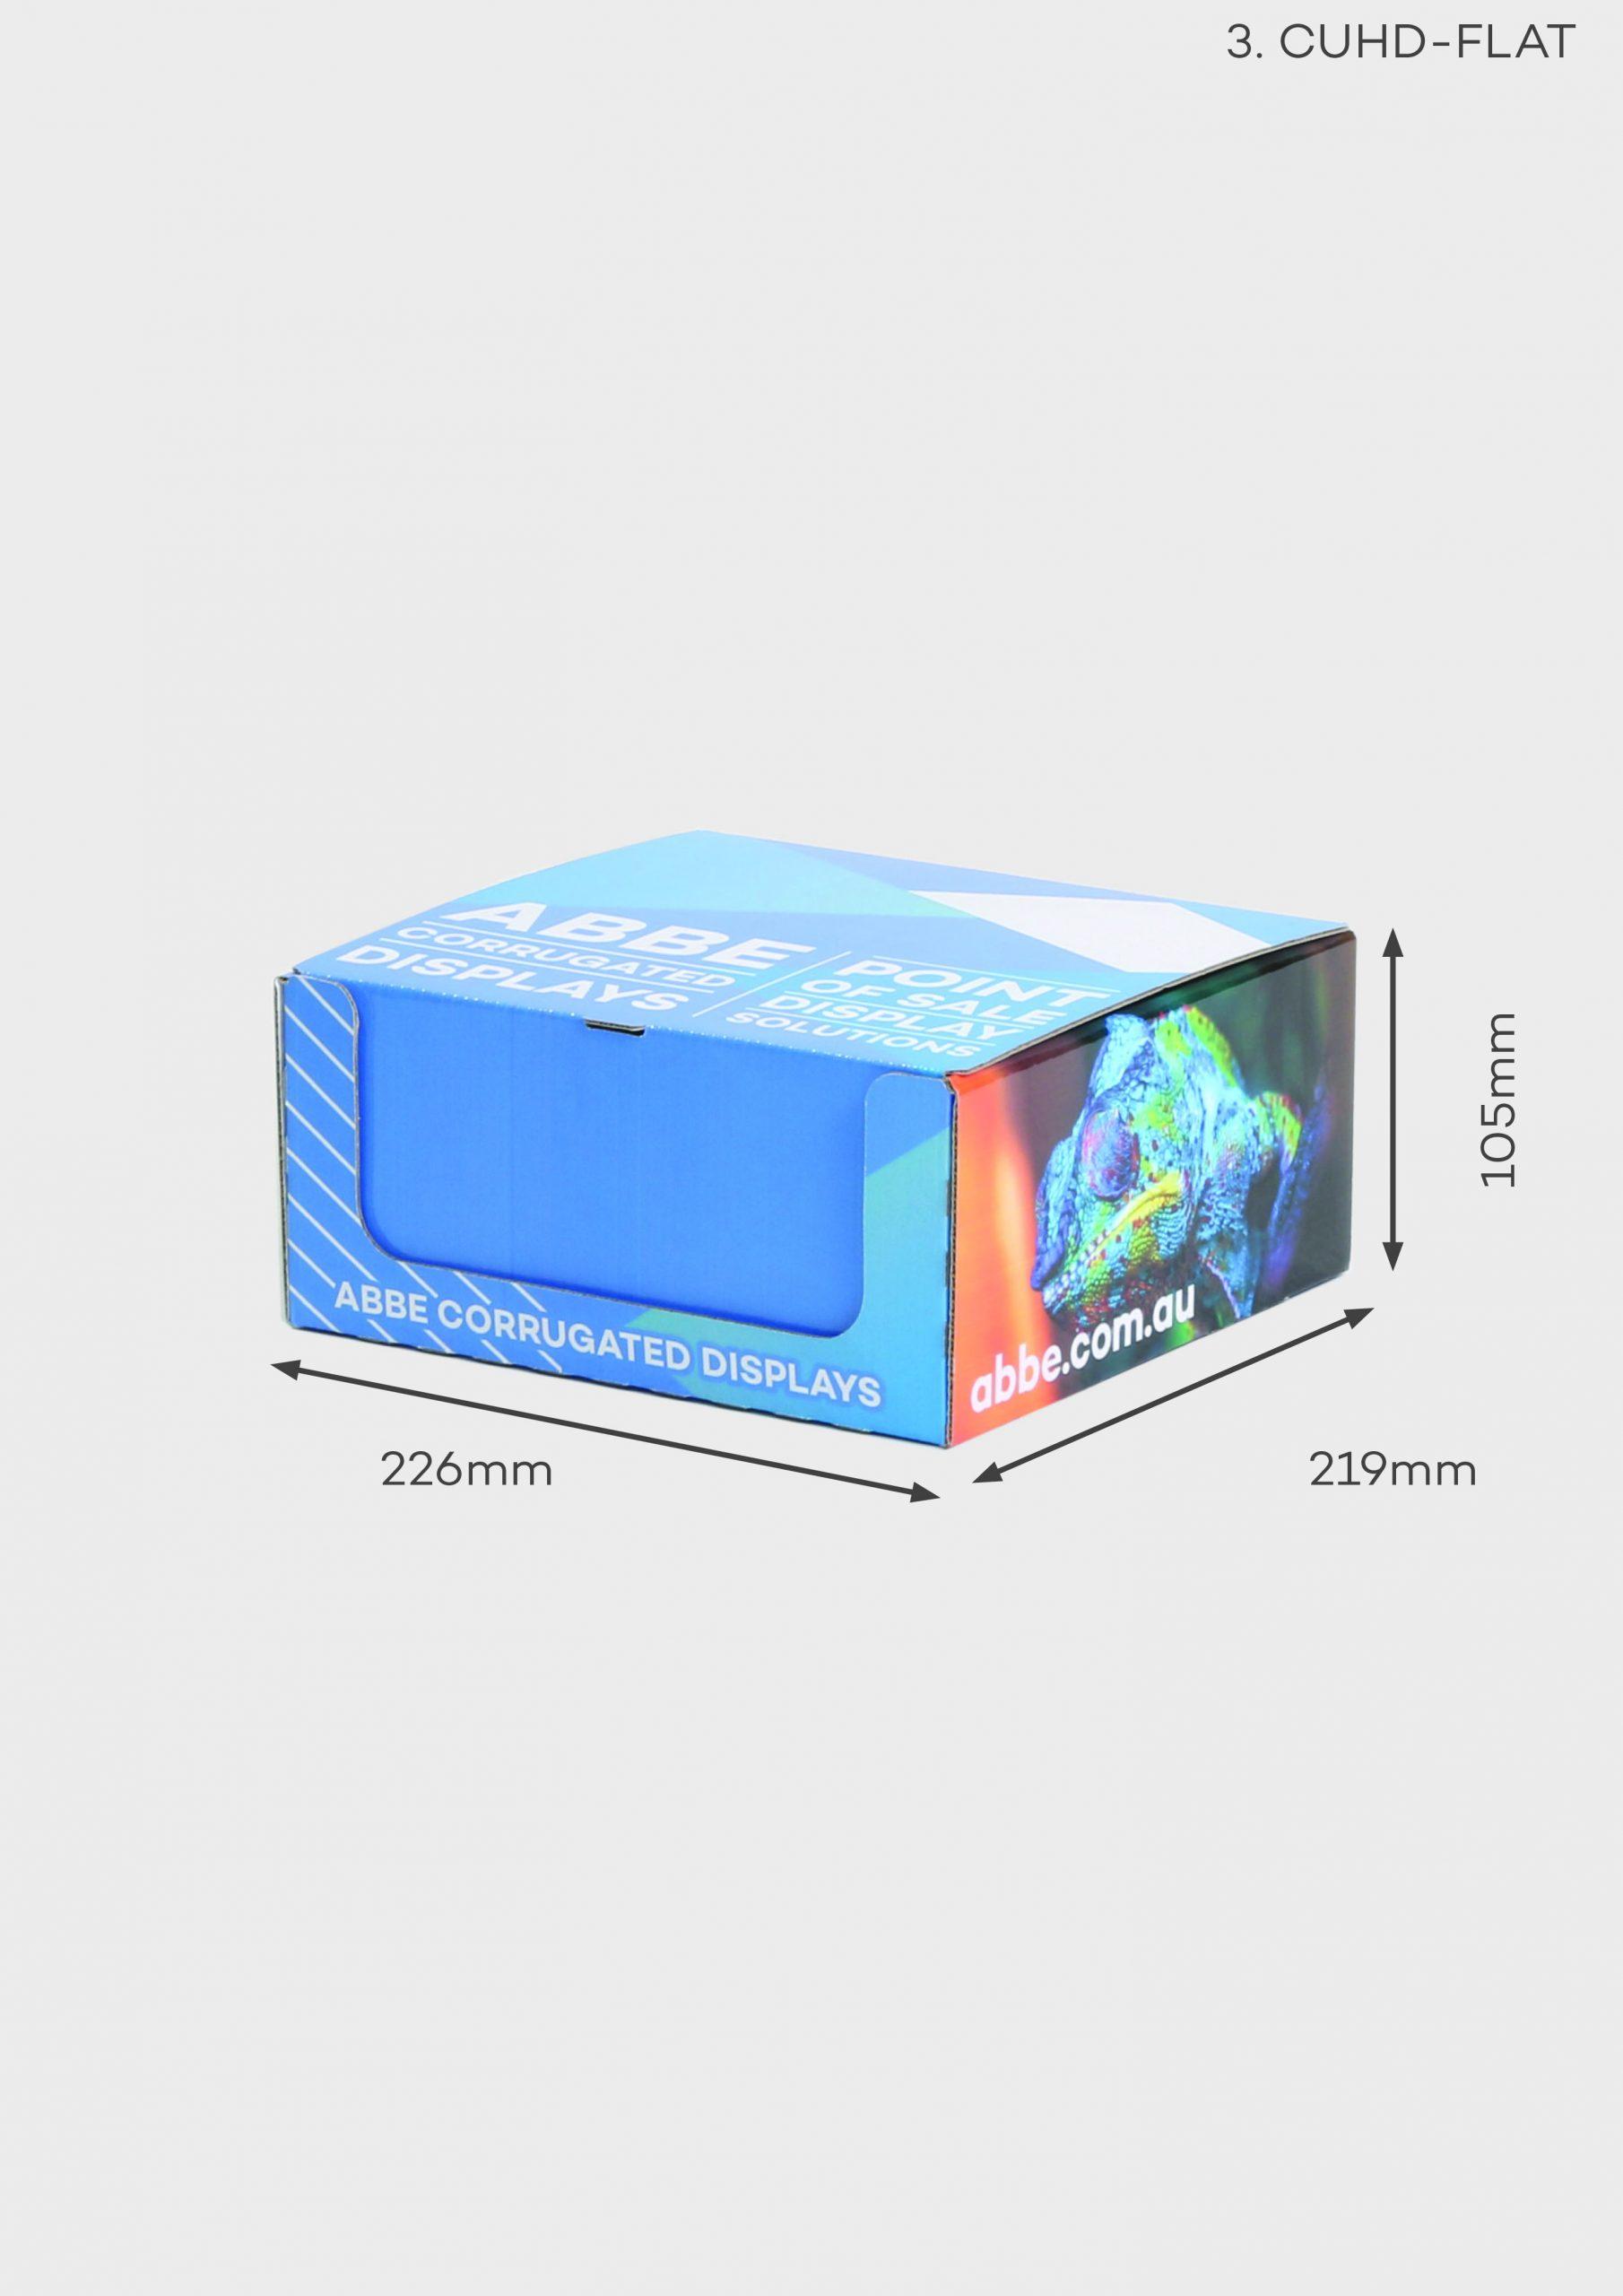 Counter Display - Mailer (Ref CUHD-FLAT)